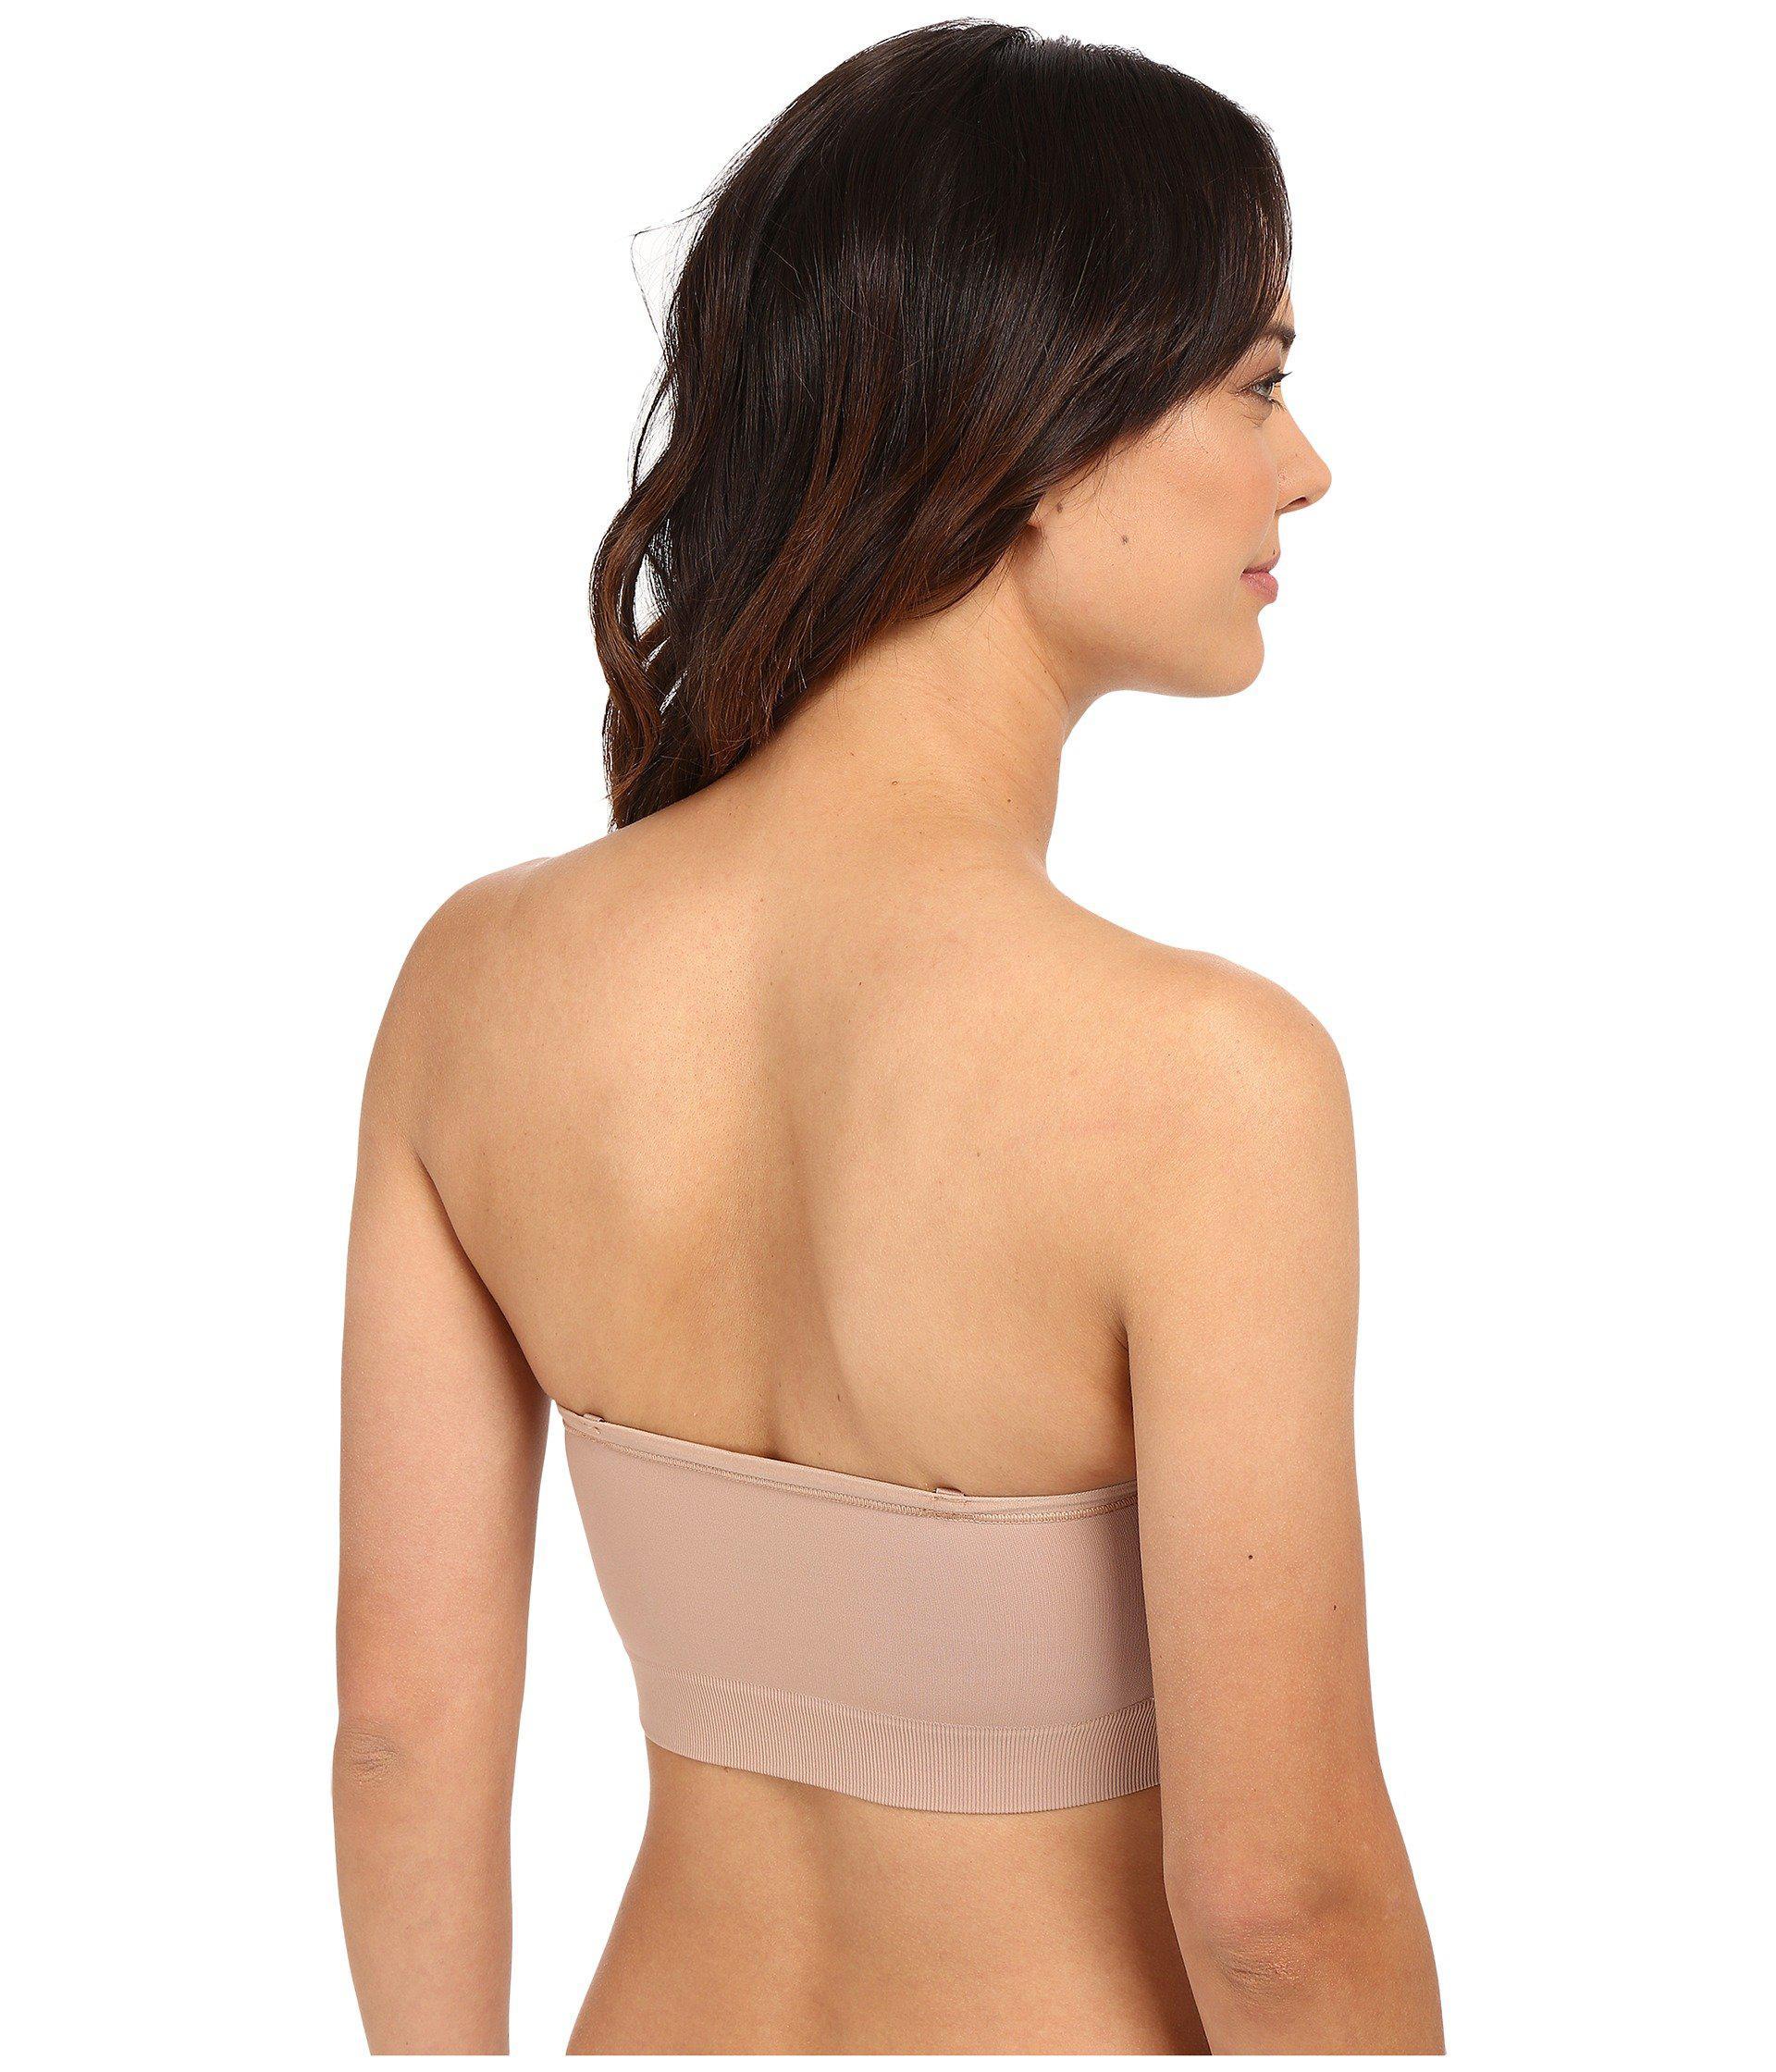 9581f2bac2c69 Yummie - Natural Peyton Ultralight Seamless Strapless Convertible Bra  (almond) Women s Bra - Lyst. View fullscreen